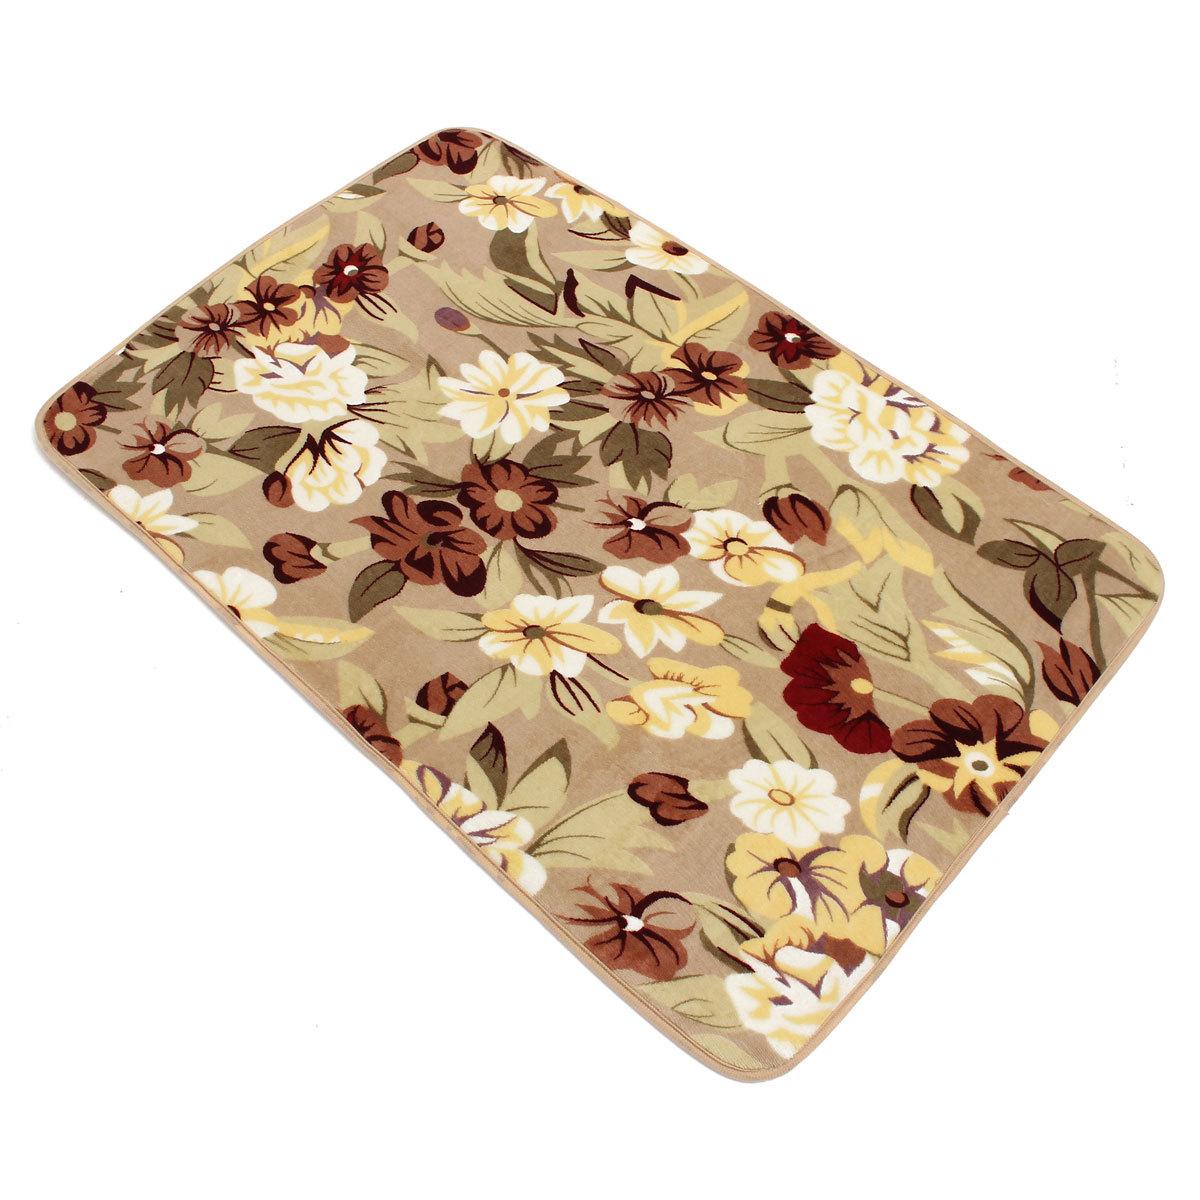 Harga 80 Cm X 50 Cm Memori Busa Penyerap Shower Kamar Mandi Pintu Kamar Mandi Lantai Tikar Karpet Non Slip Rosemary Yang